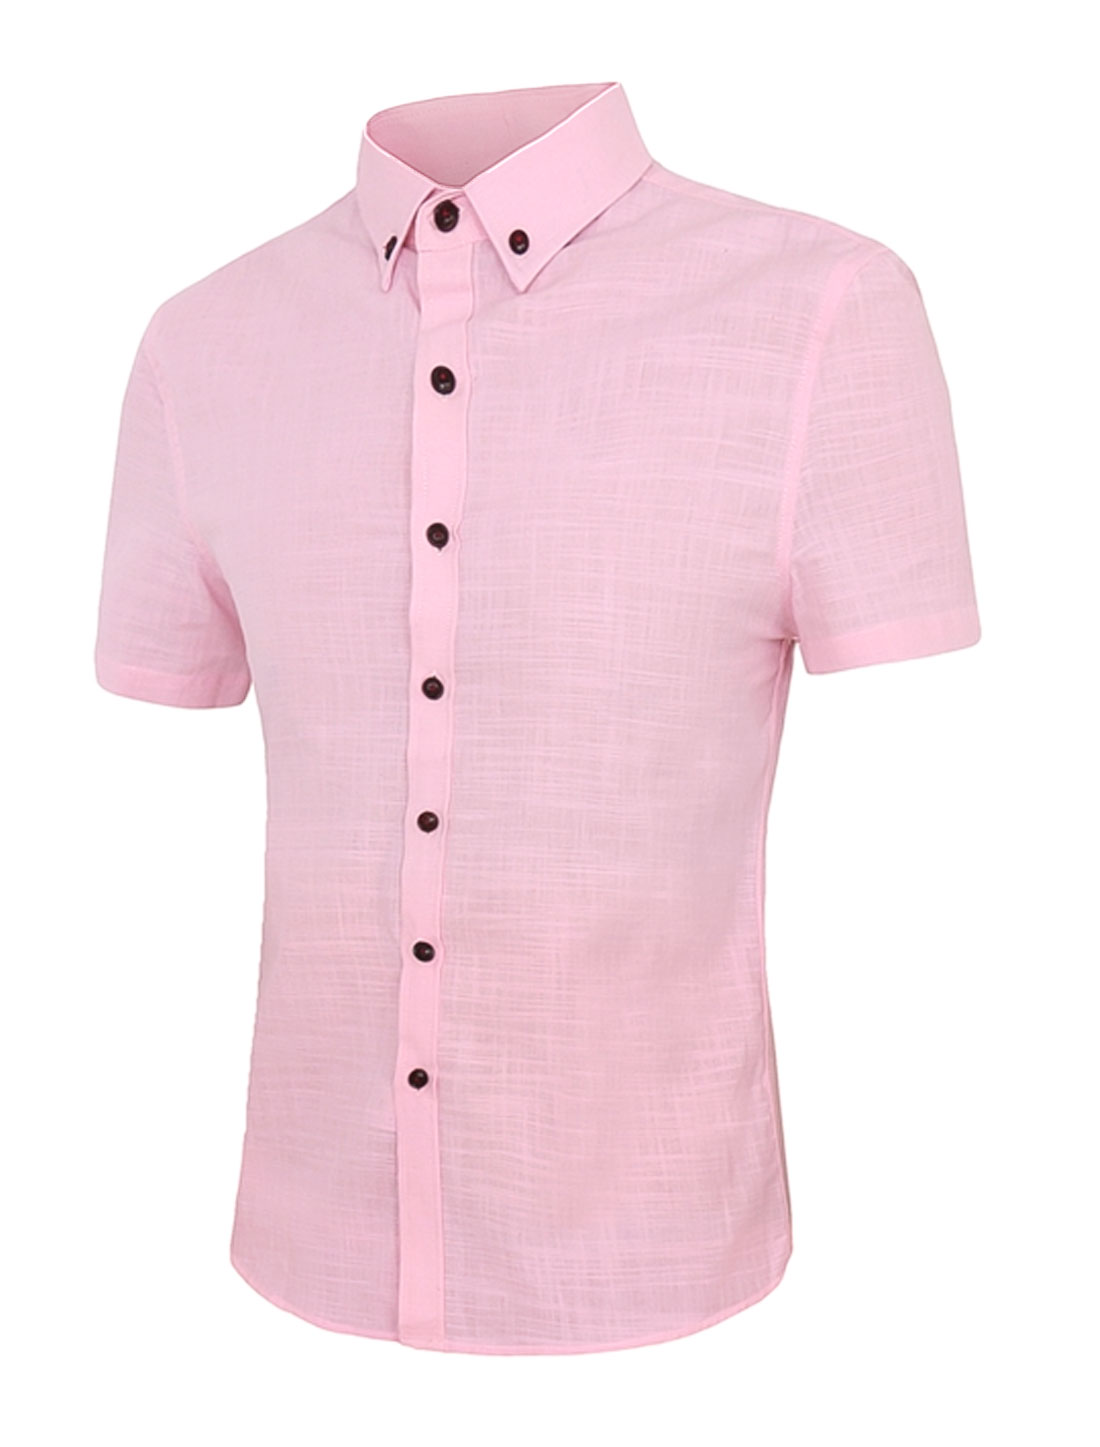 Men Point Collar Short Sleeves Slim Fit Button Down Shirt Pink M